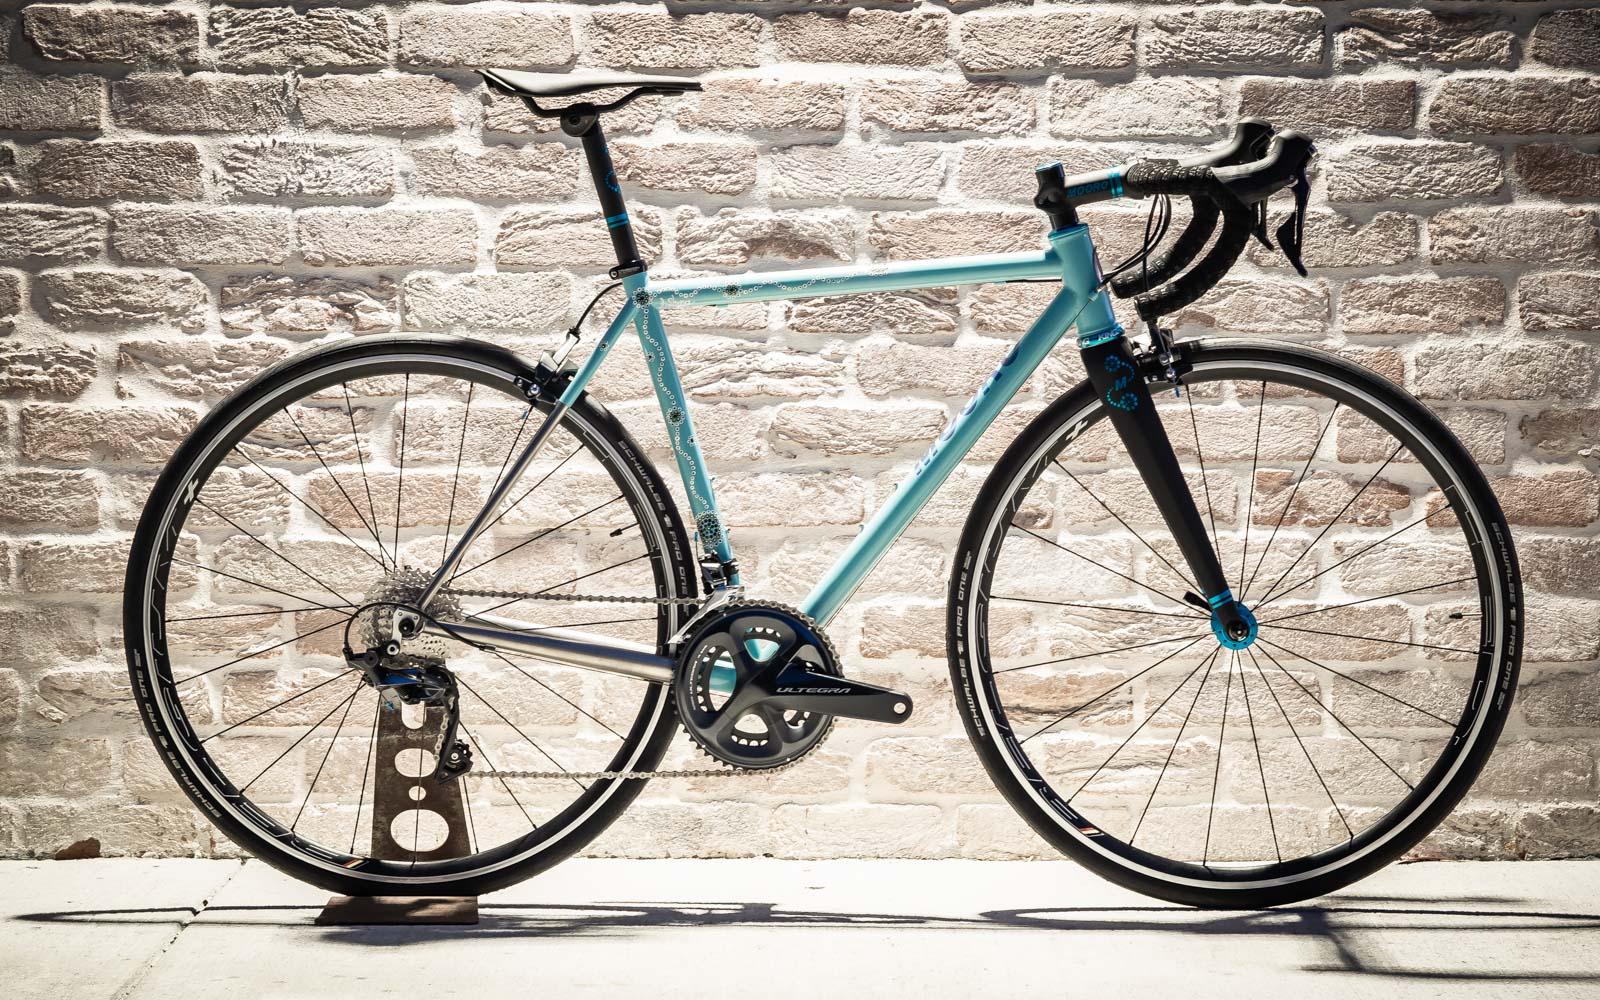 Mooro Cycles Custom Titanium Bicycle Frames Handmade In